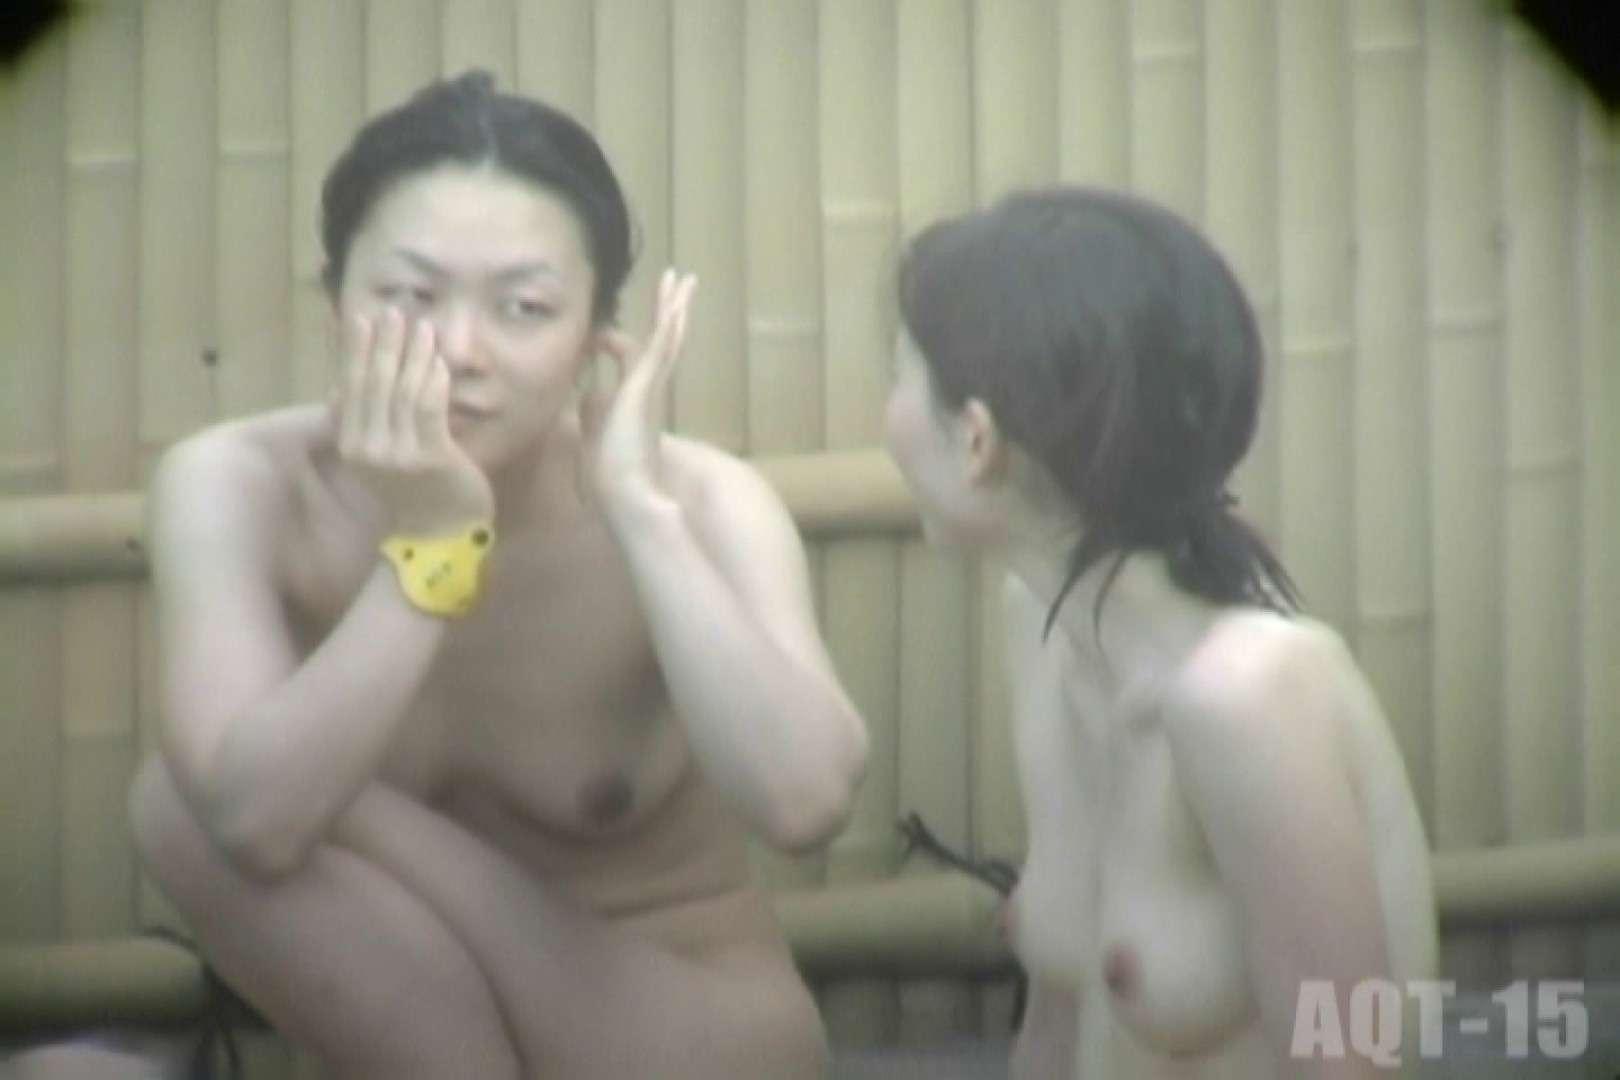 Aquaな露天風呂Vol.835 盗撮 | HなOL  73pic 8